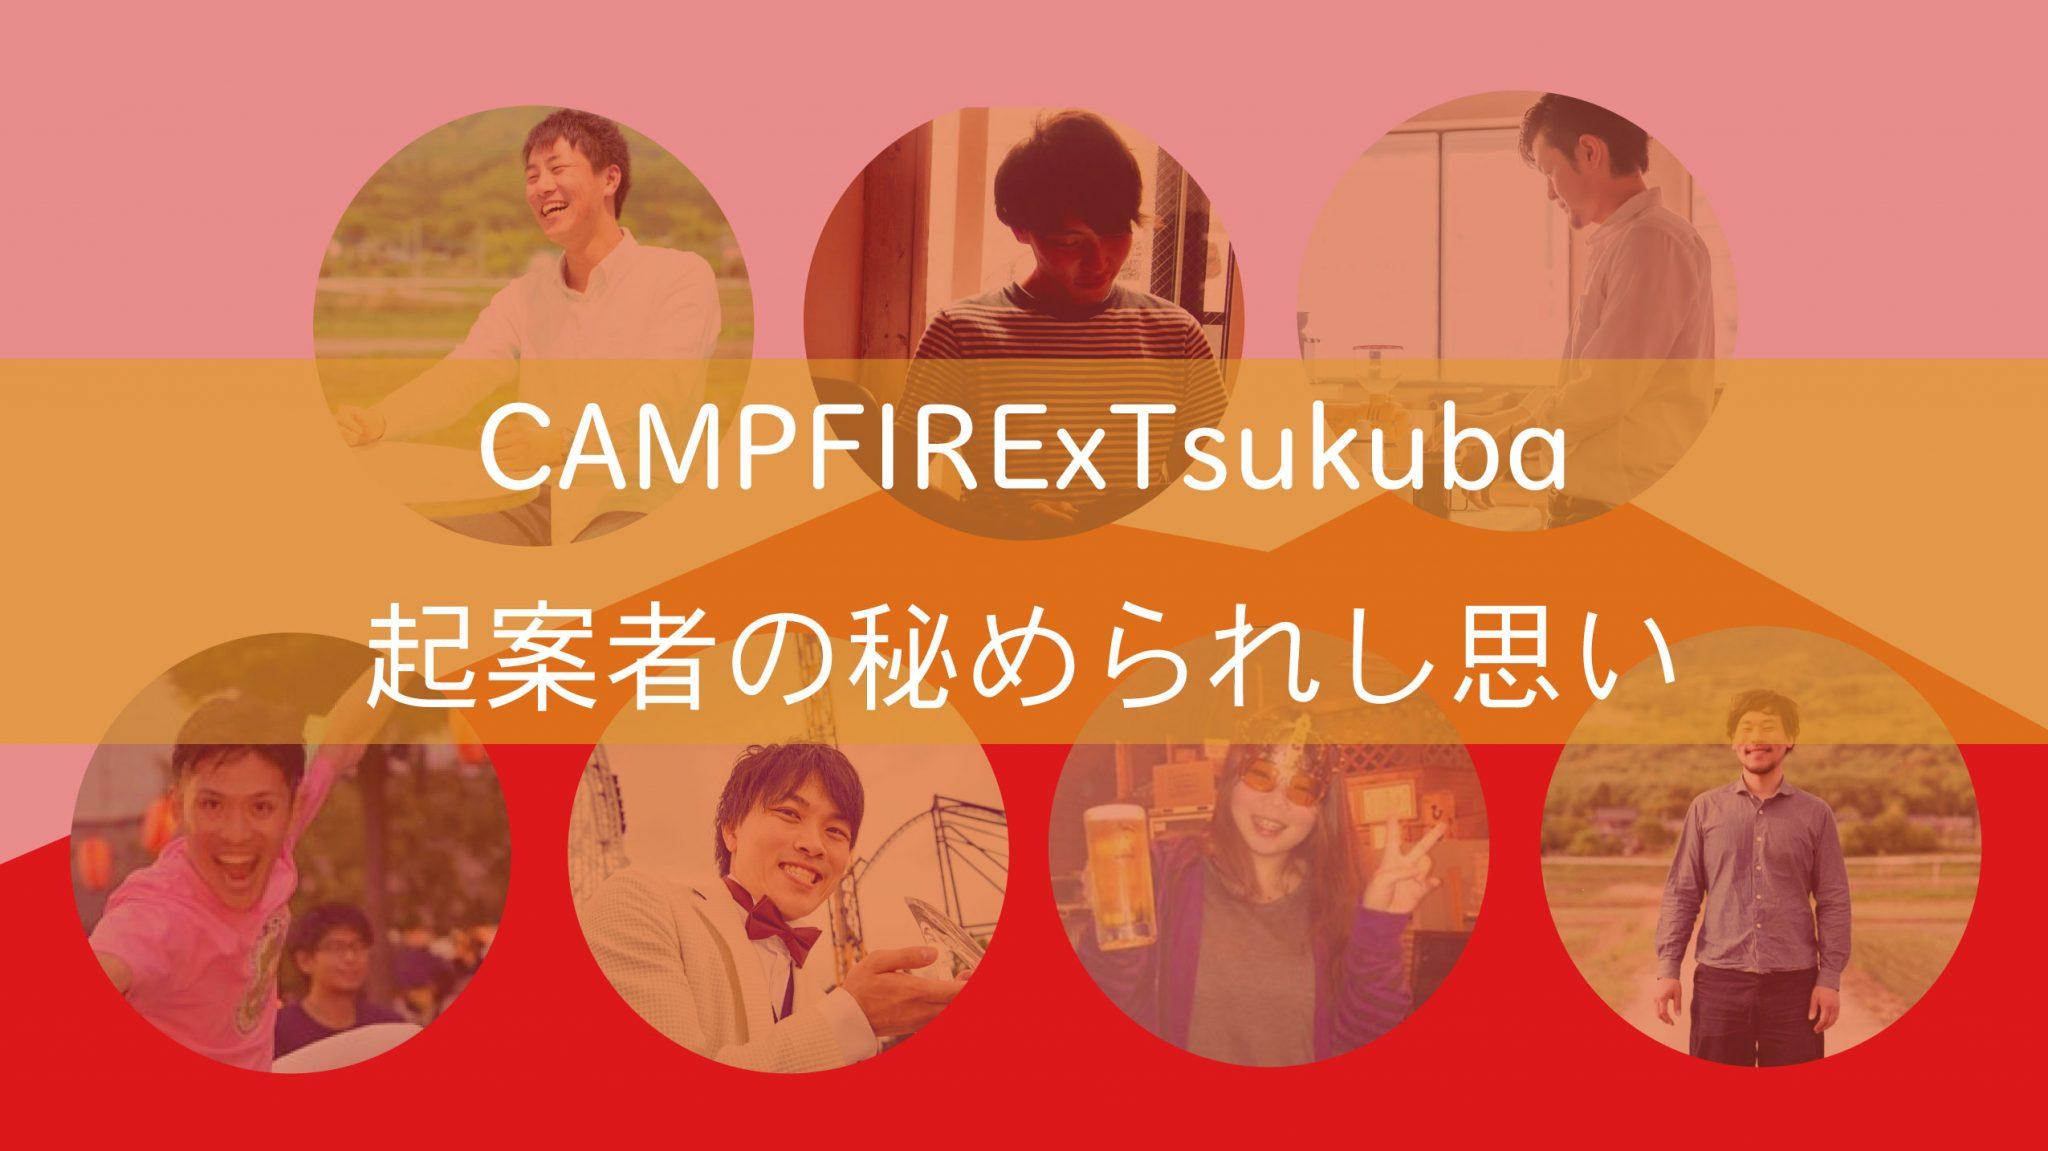 CAMPFIRExTsukuba起案者の秘められし思いに迫る